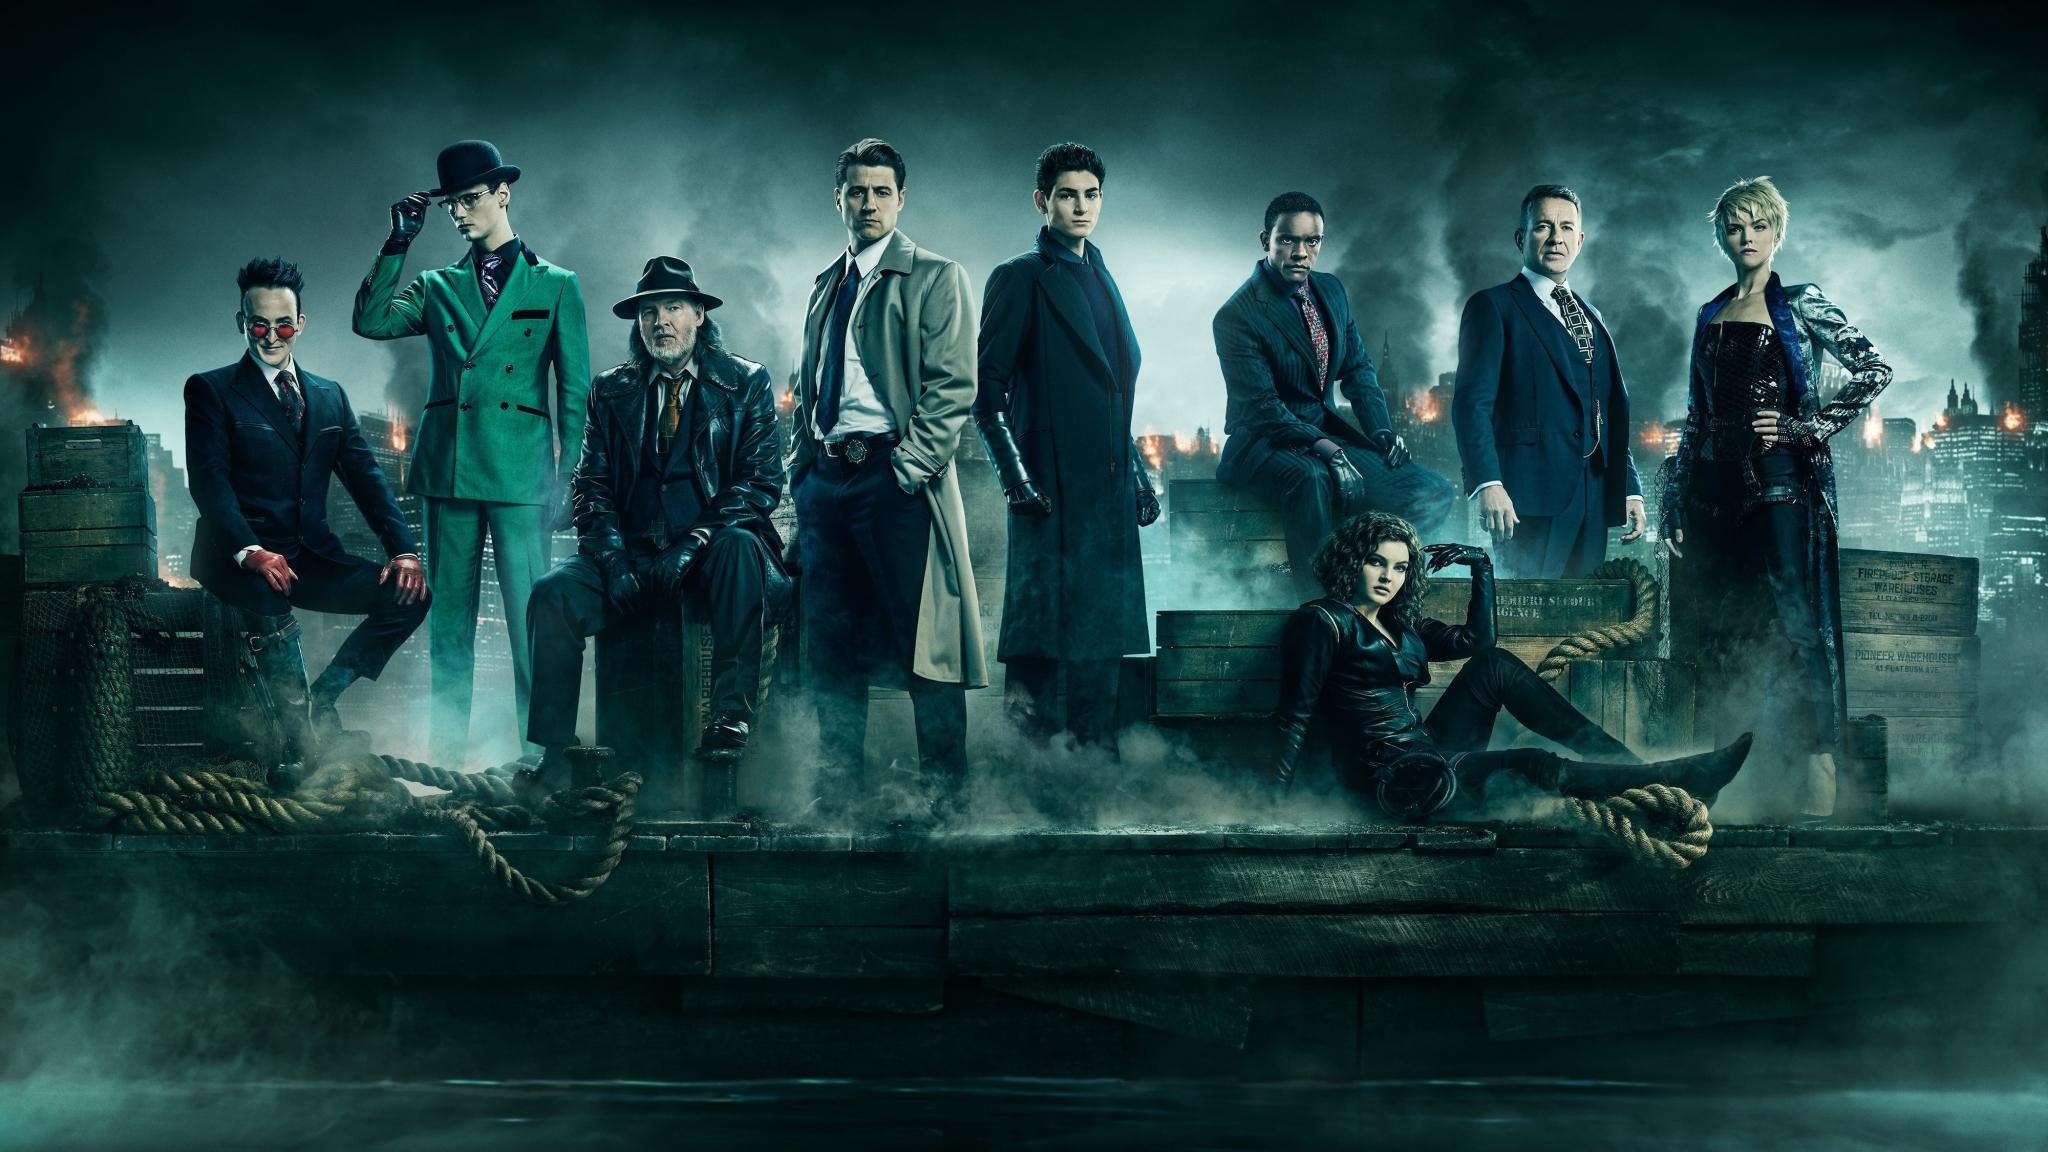 2048x1152 Gotham Season 5 2048x1152 Resolution Wallpaper Hd